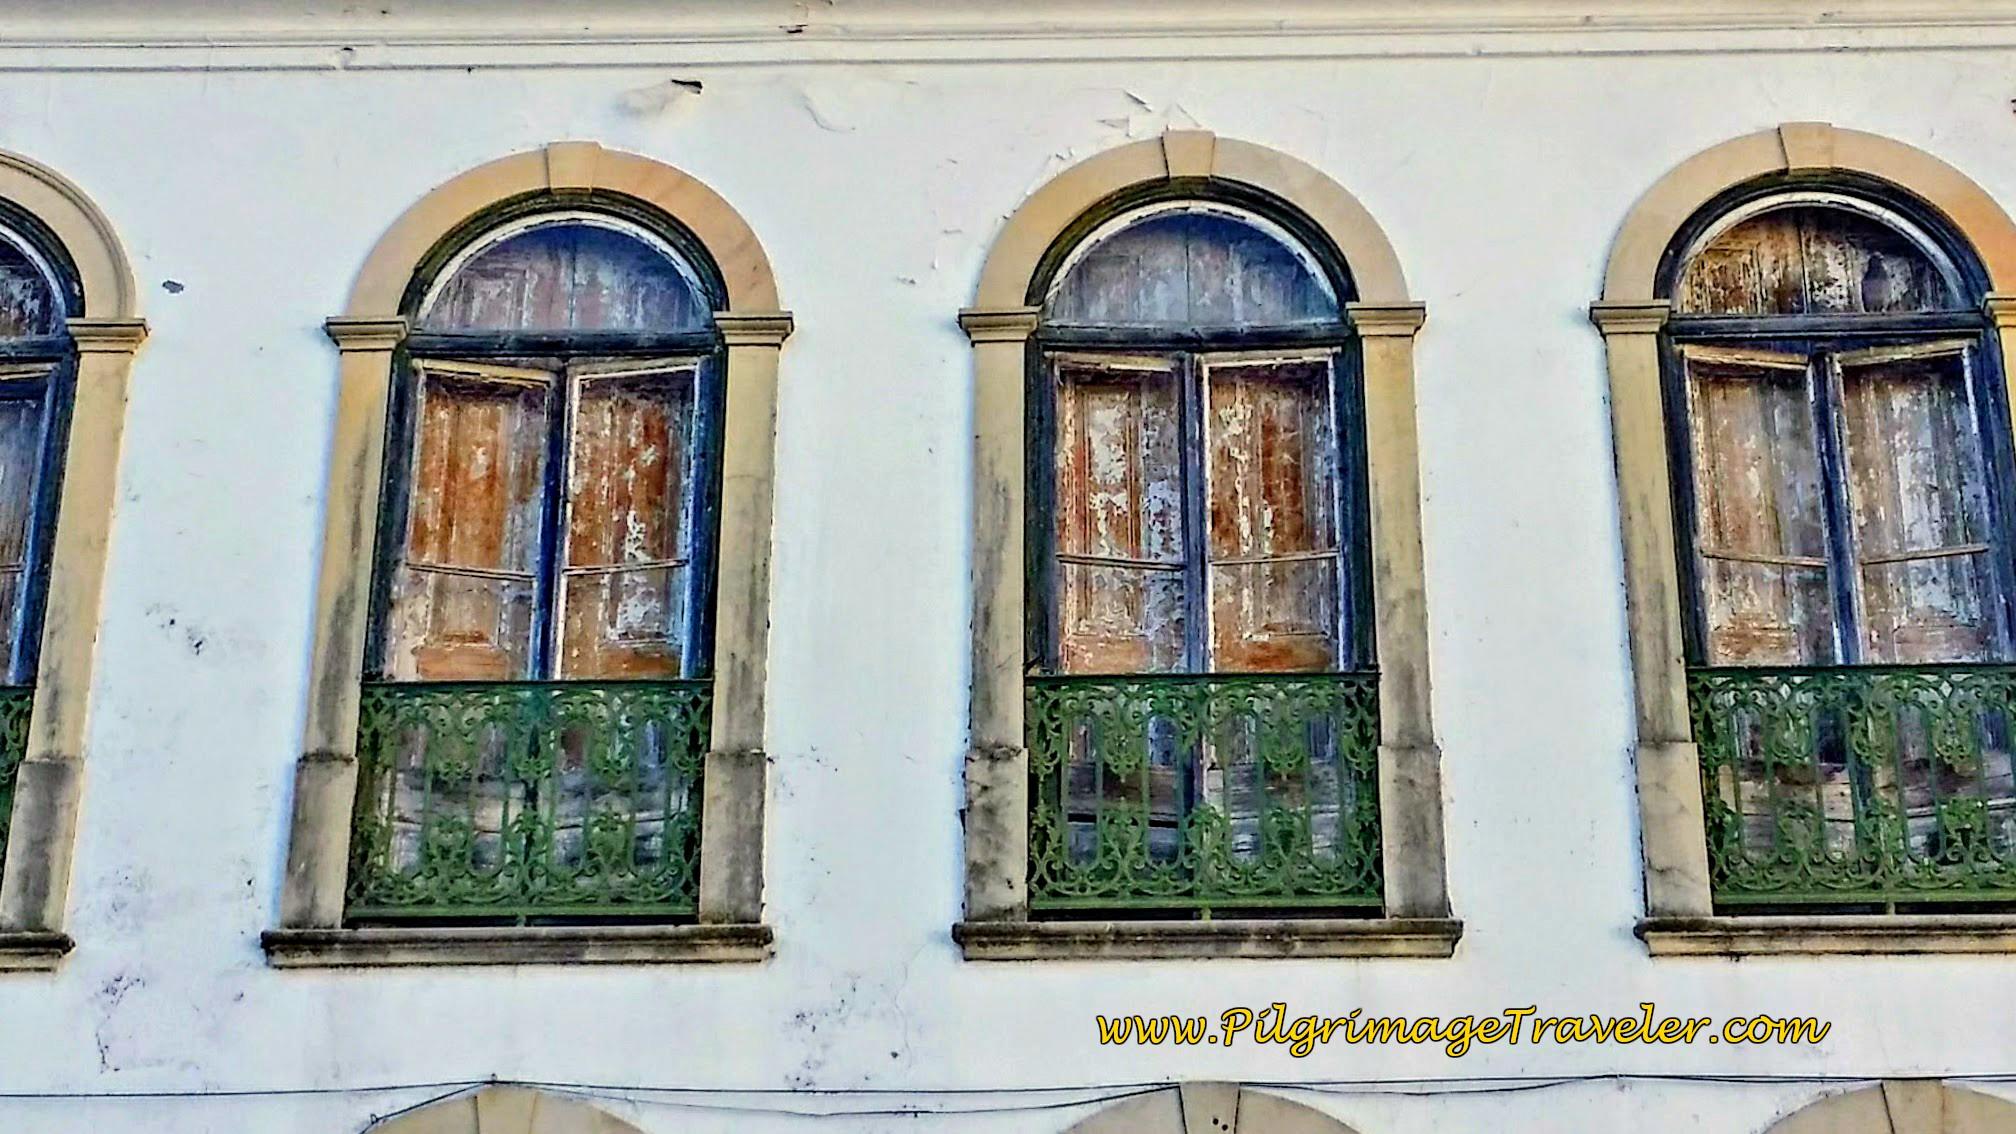 Close-Up of the Windows at Café Pepe's